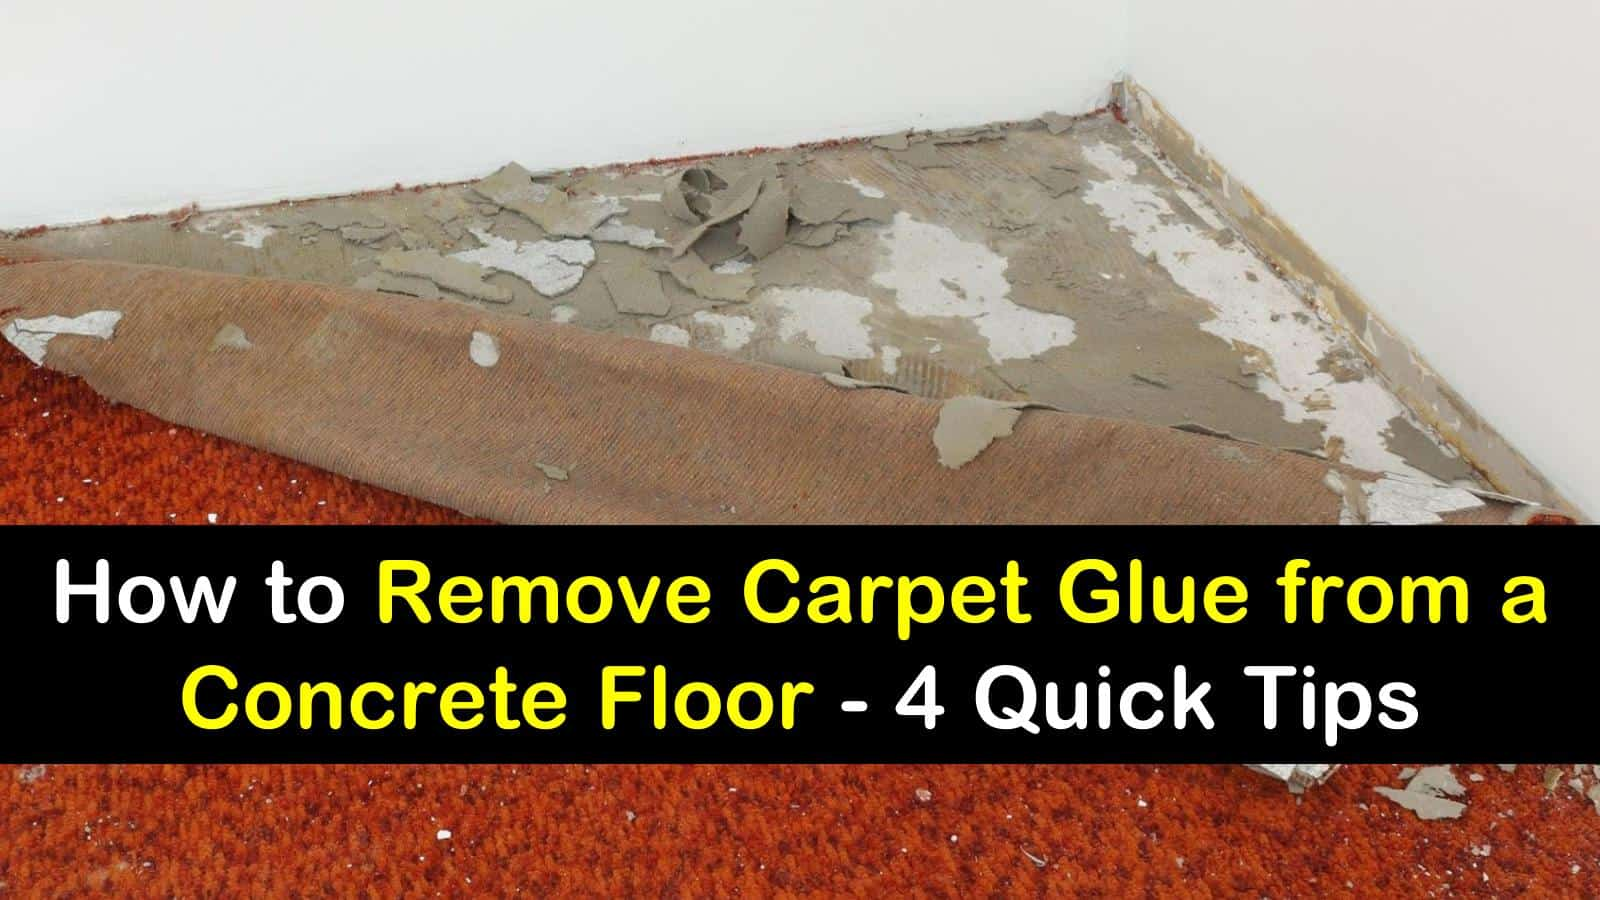 Remove Carpet Glue From A Concrete Floor